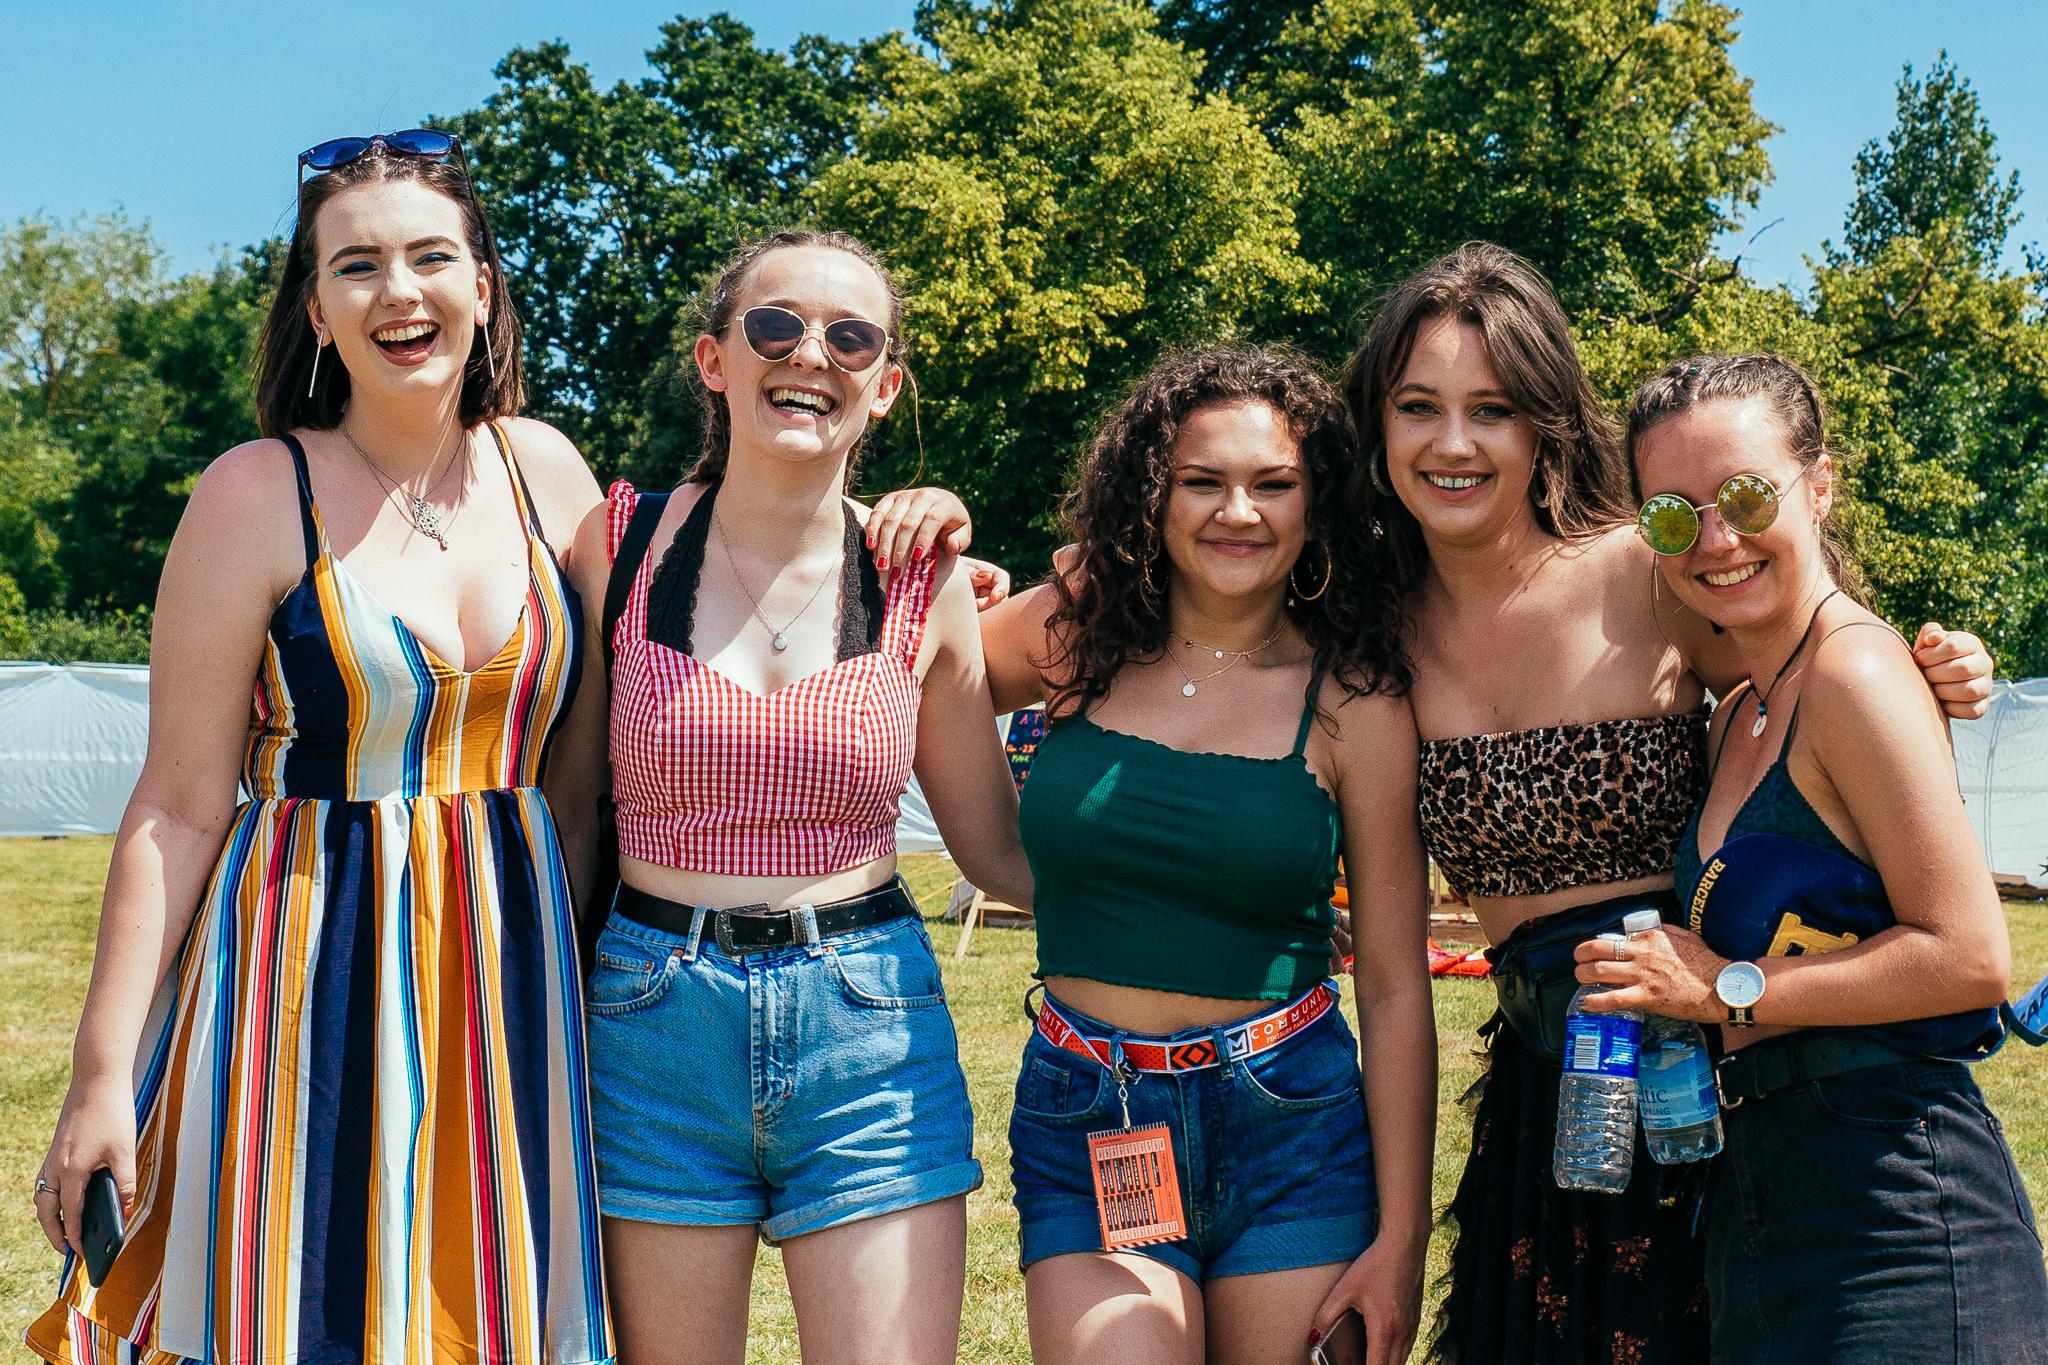 Community_Festival_2018_Michelle_Roberts (3).jpg